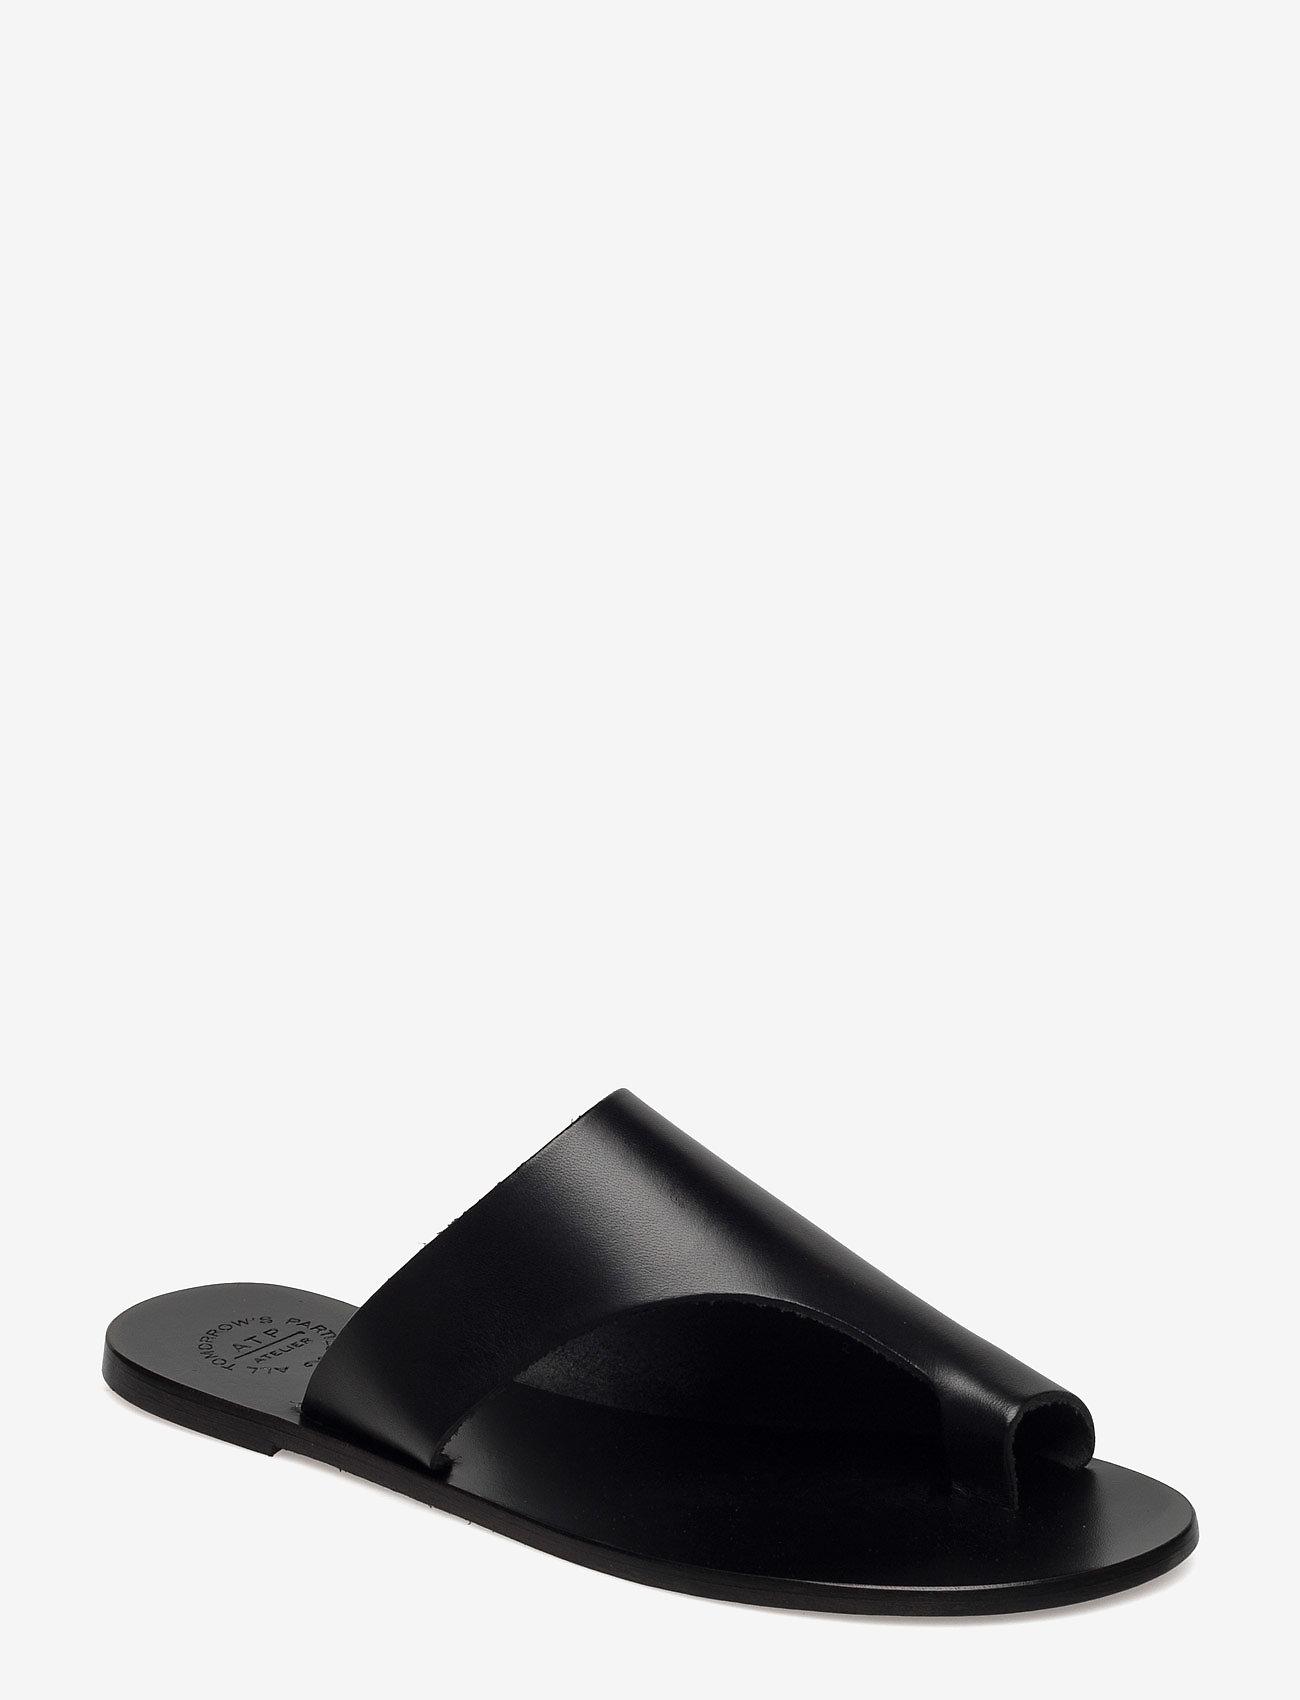 ATP Atelier - Rosa Black Vacchetta - flat sandals - black - 0